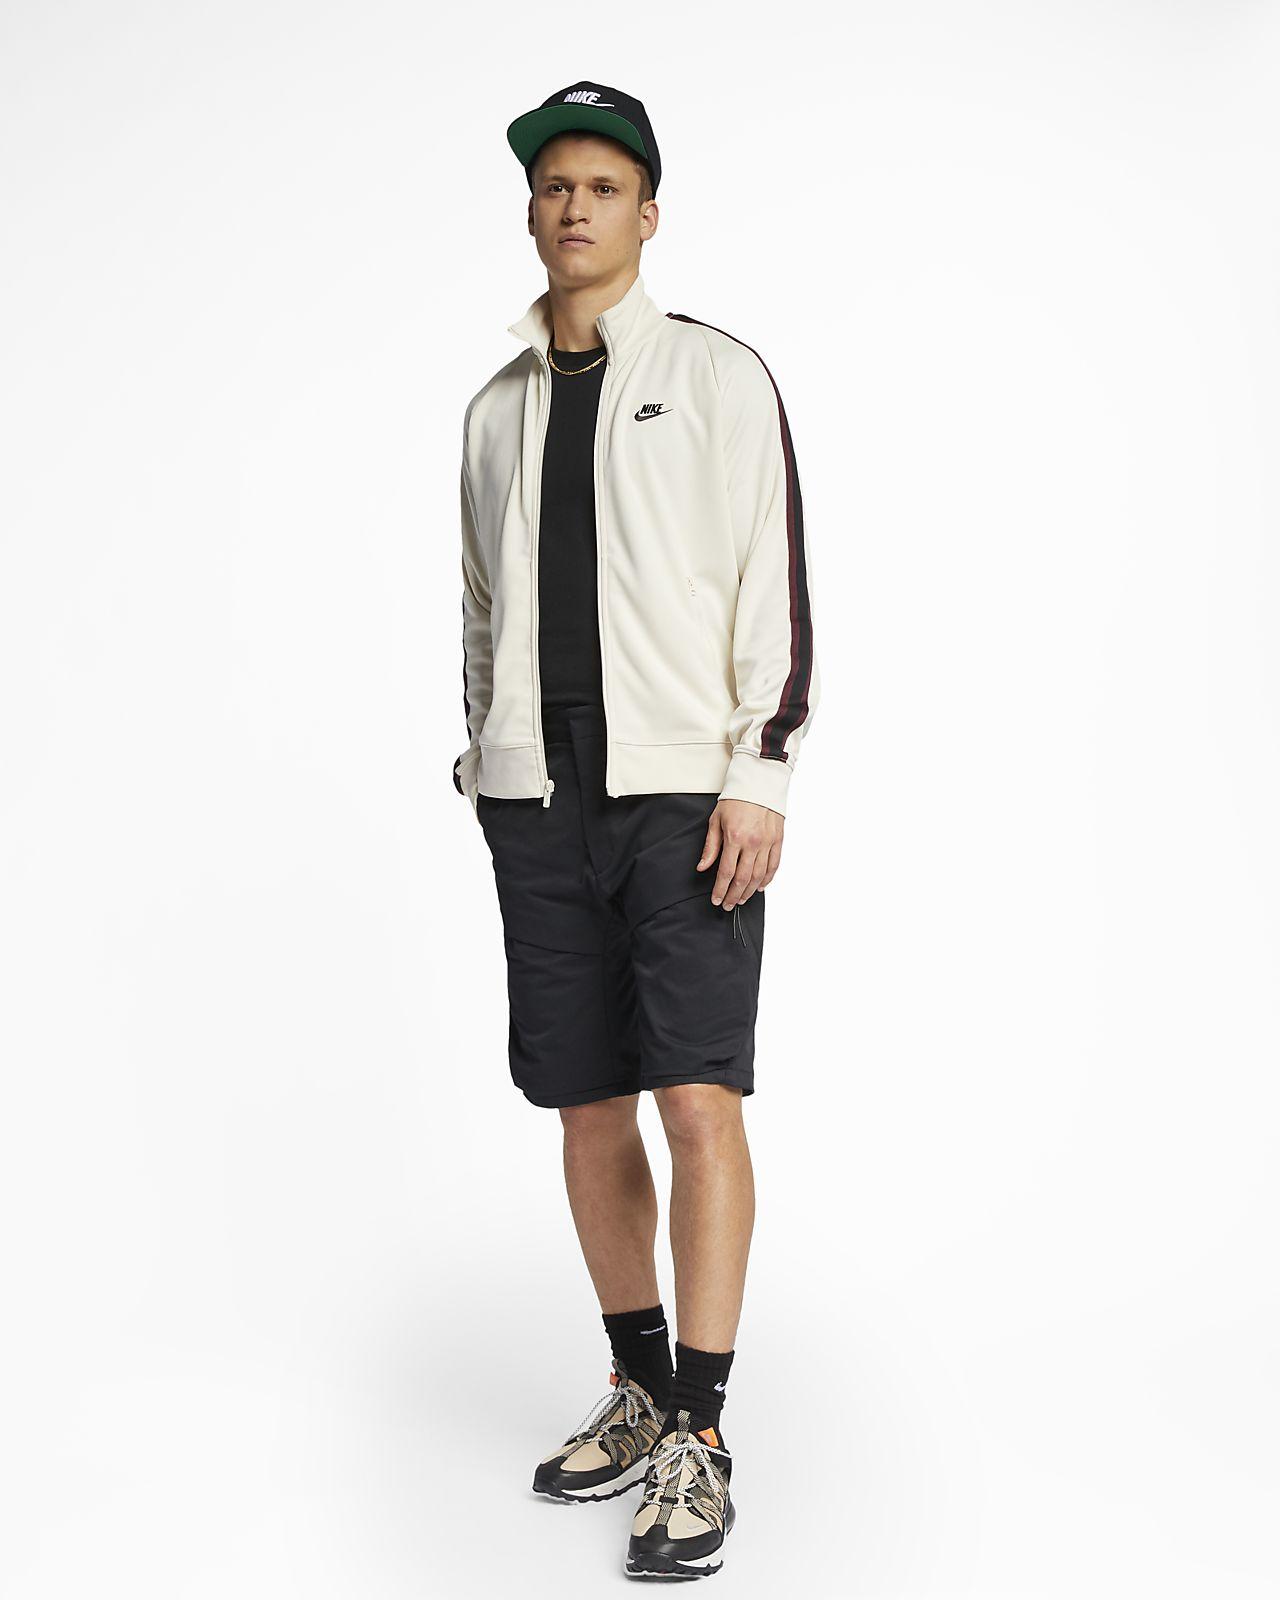 8e67c9ae0 Nike Sportswear N98 Men's Knit Warm-Up Jacket. Nike.com NL